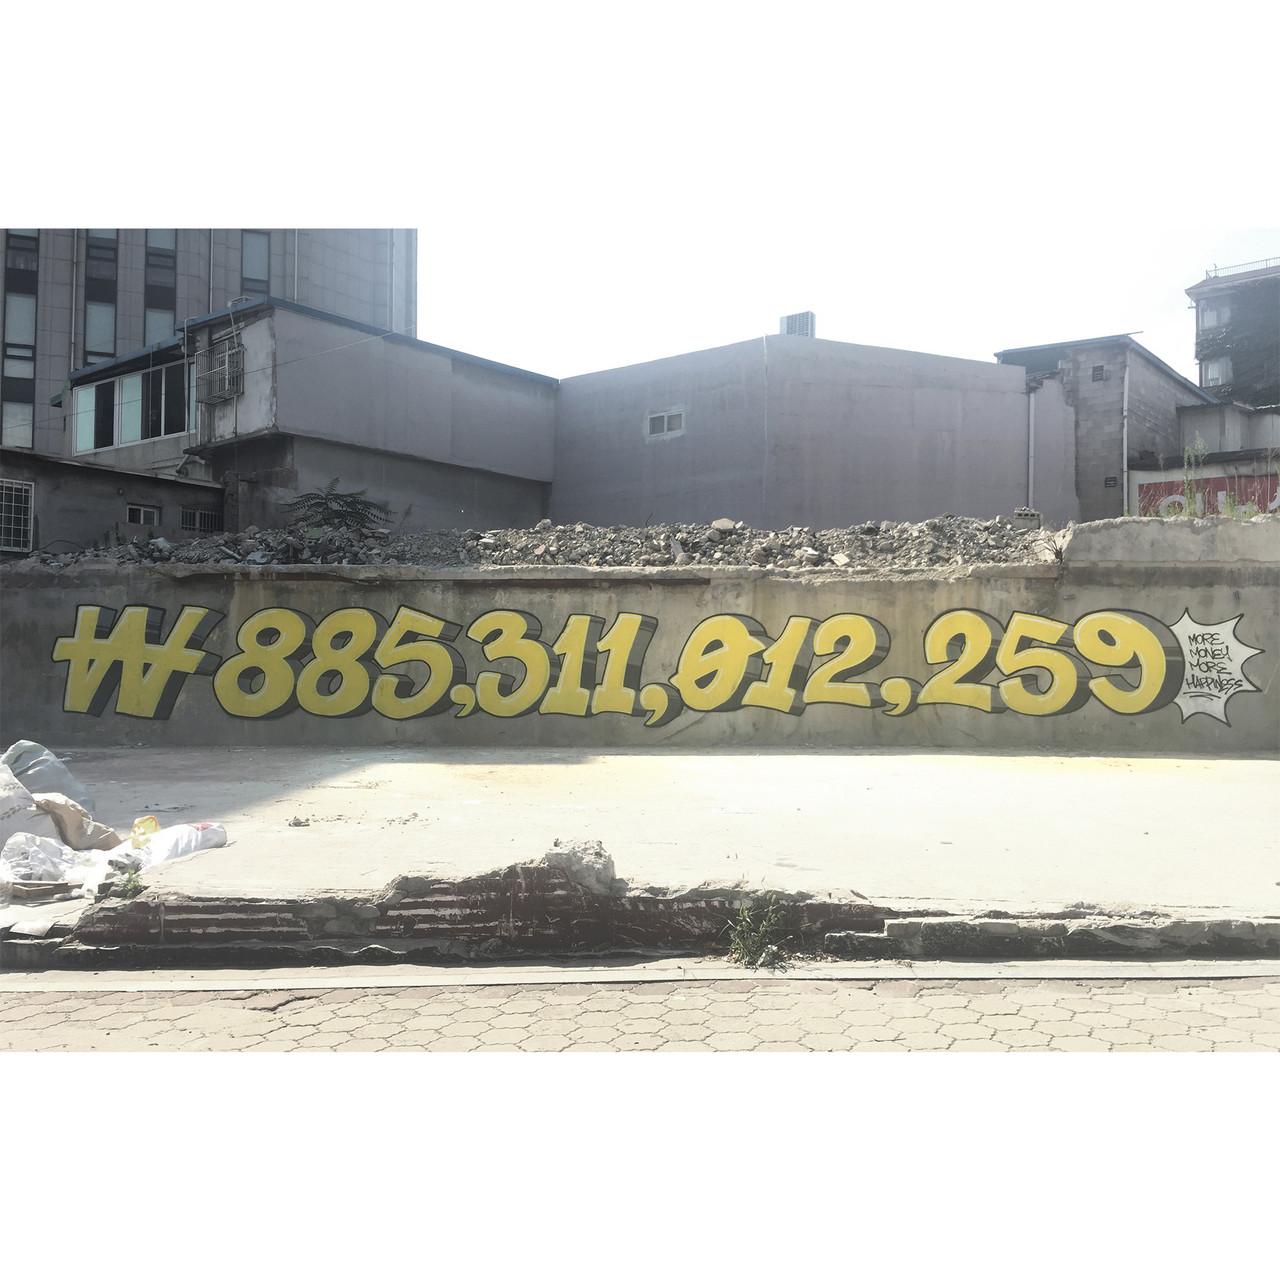 'Price' series _ KRW 885,311,012,259